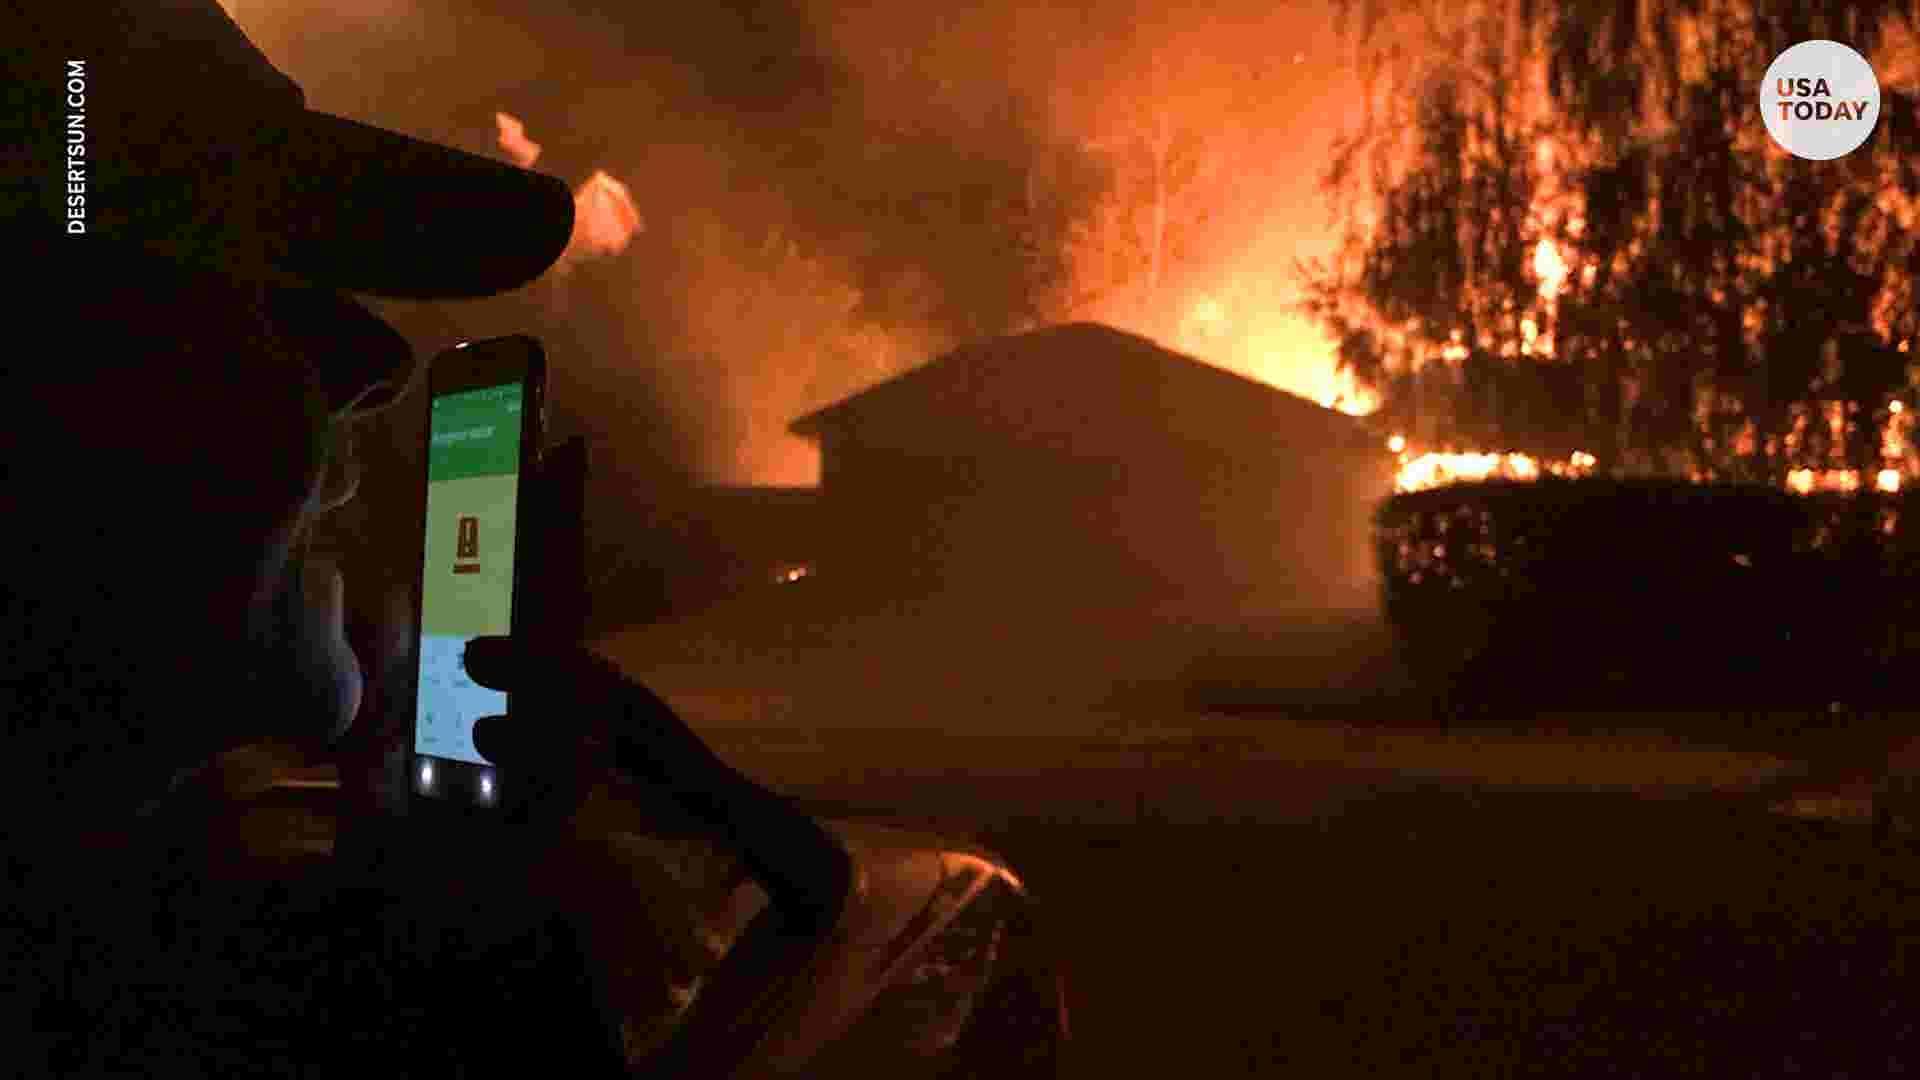 Woolsey Fire: Woman dials 911 as her neighborhood burns around her